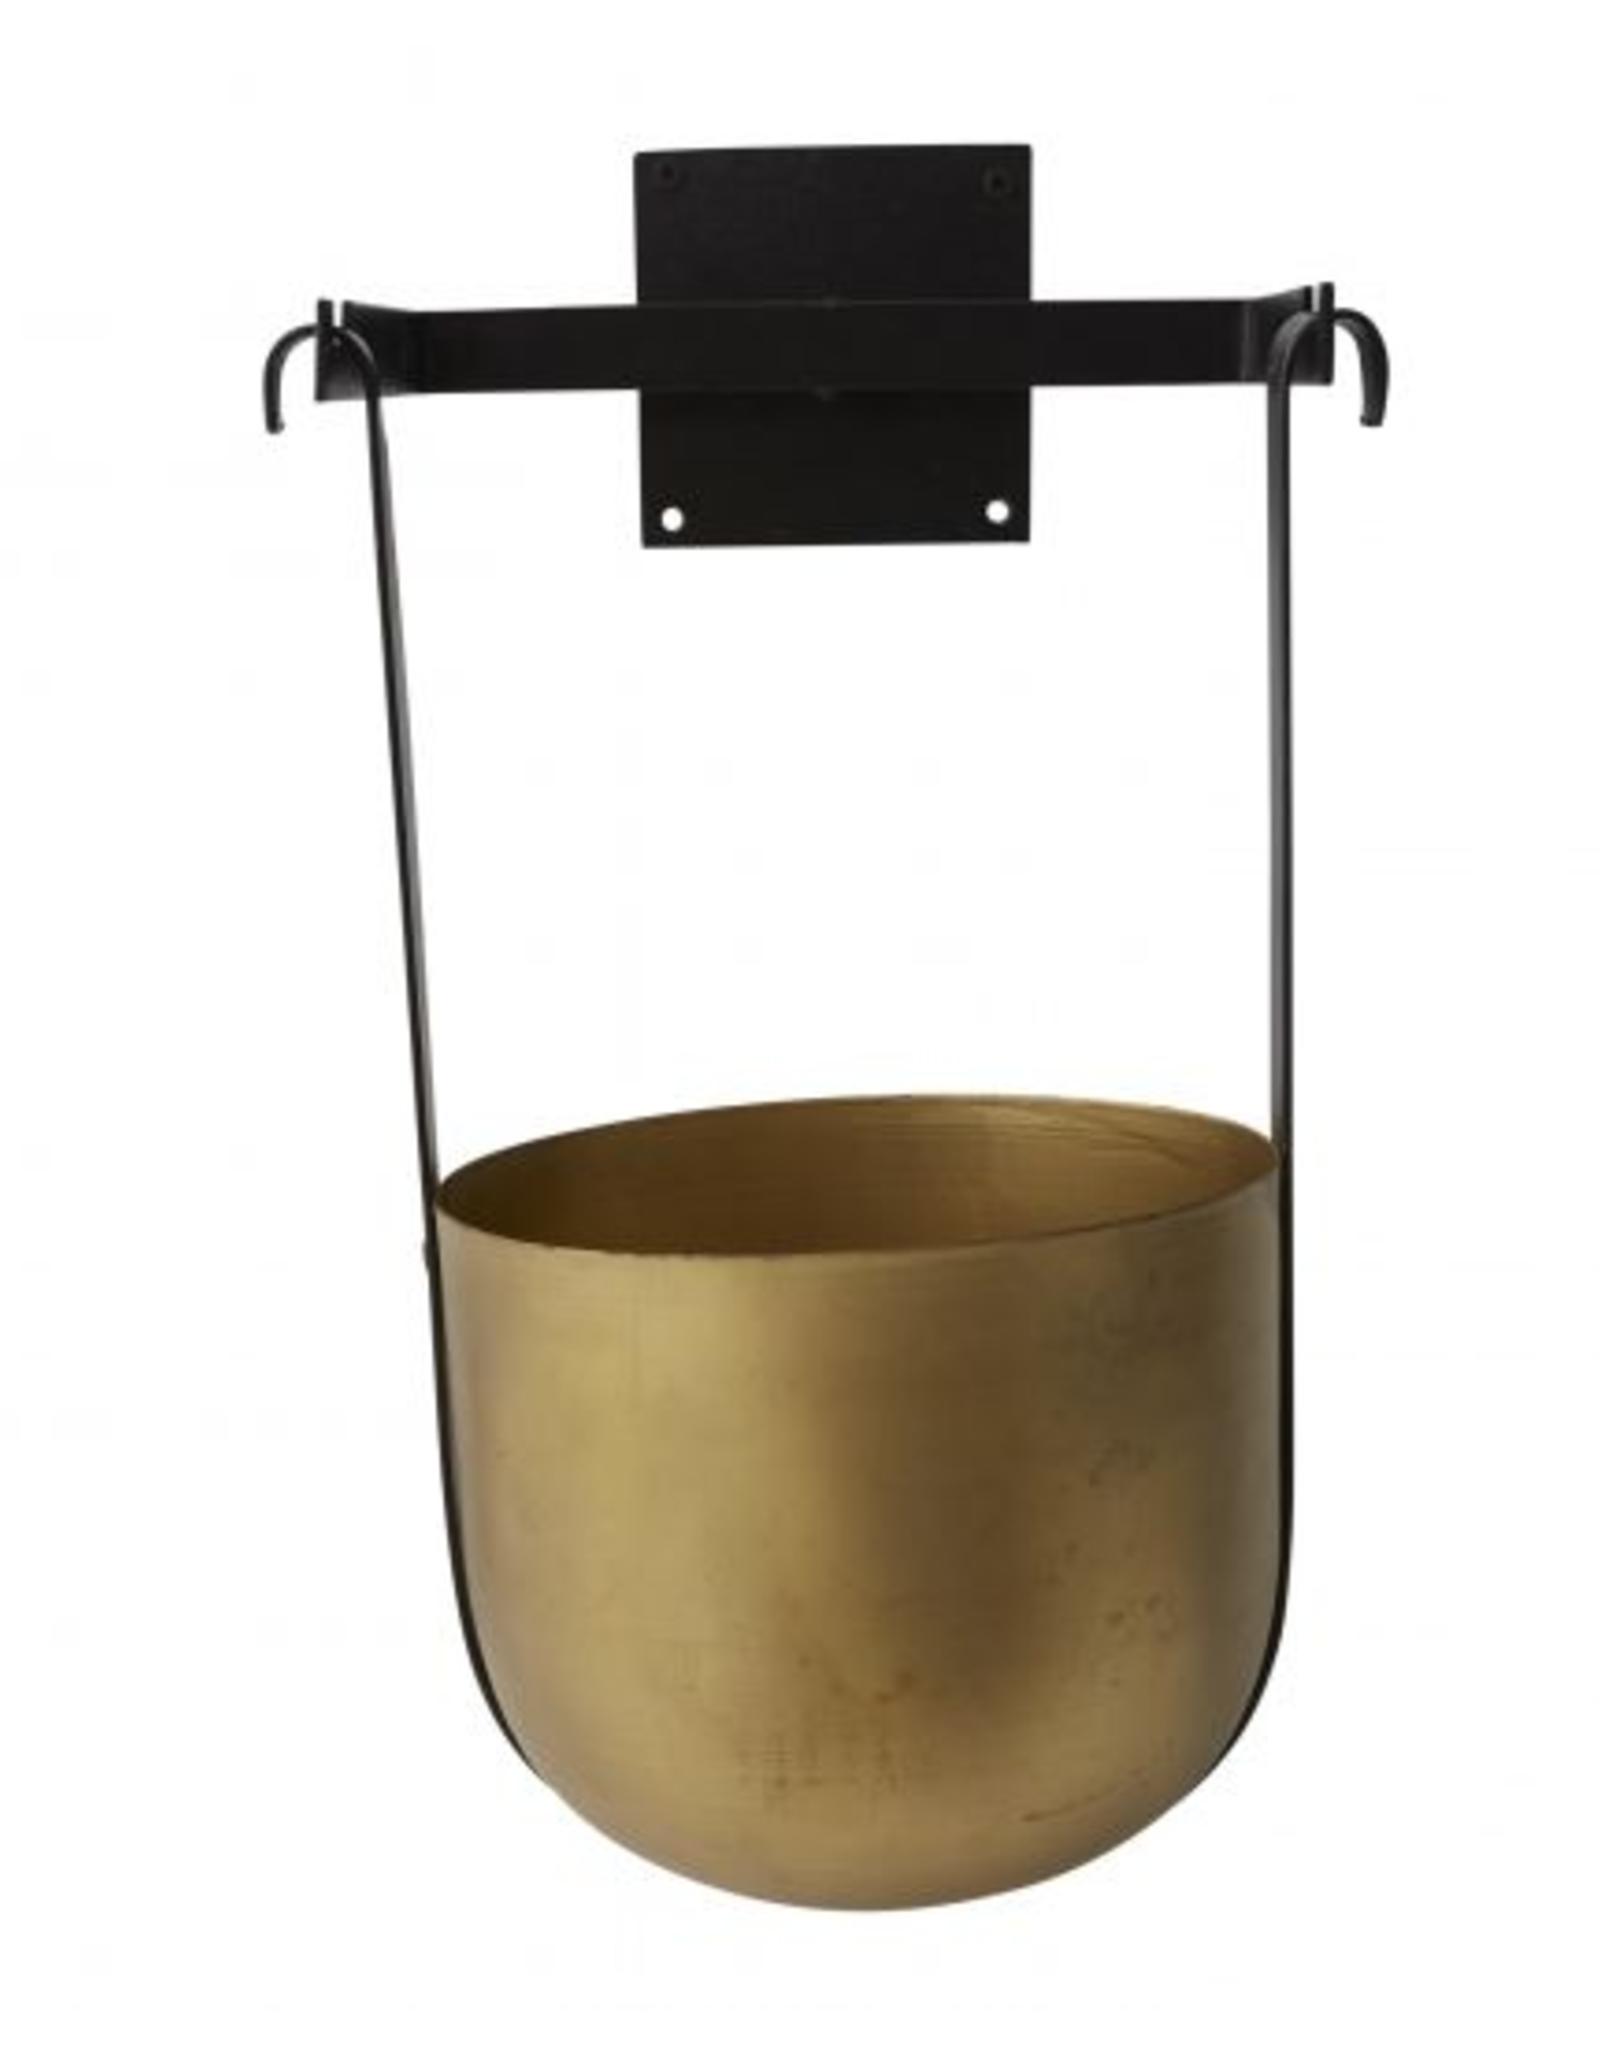 "Large Benton Hanging Pot W12.25"" D10"" H17.5"""